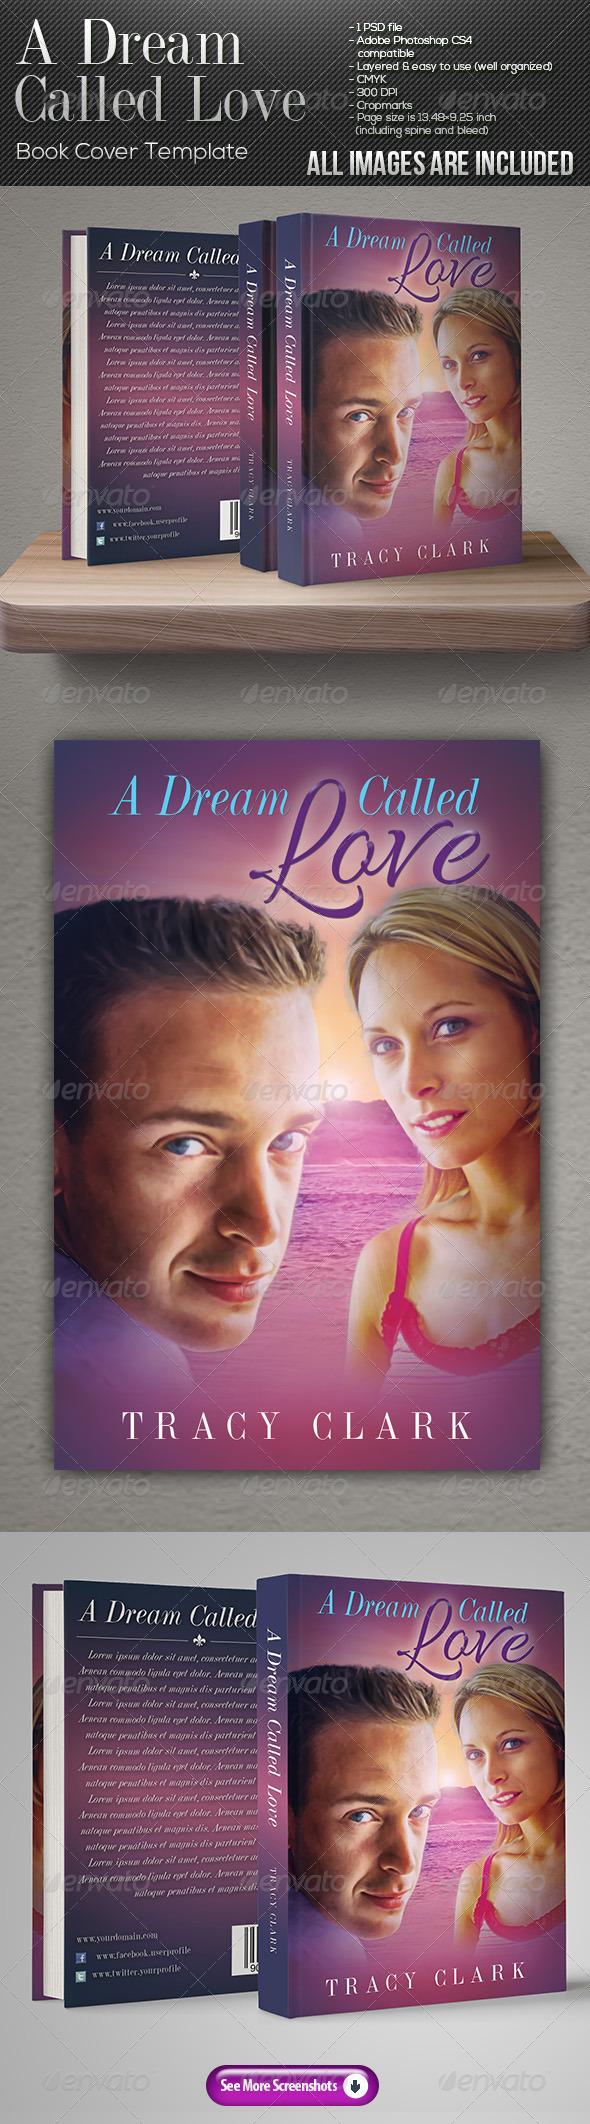 GraphicRiver A Dream Called Love Book Cover Template 7873557